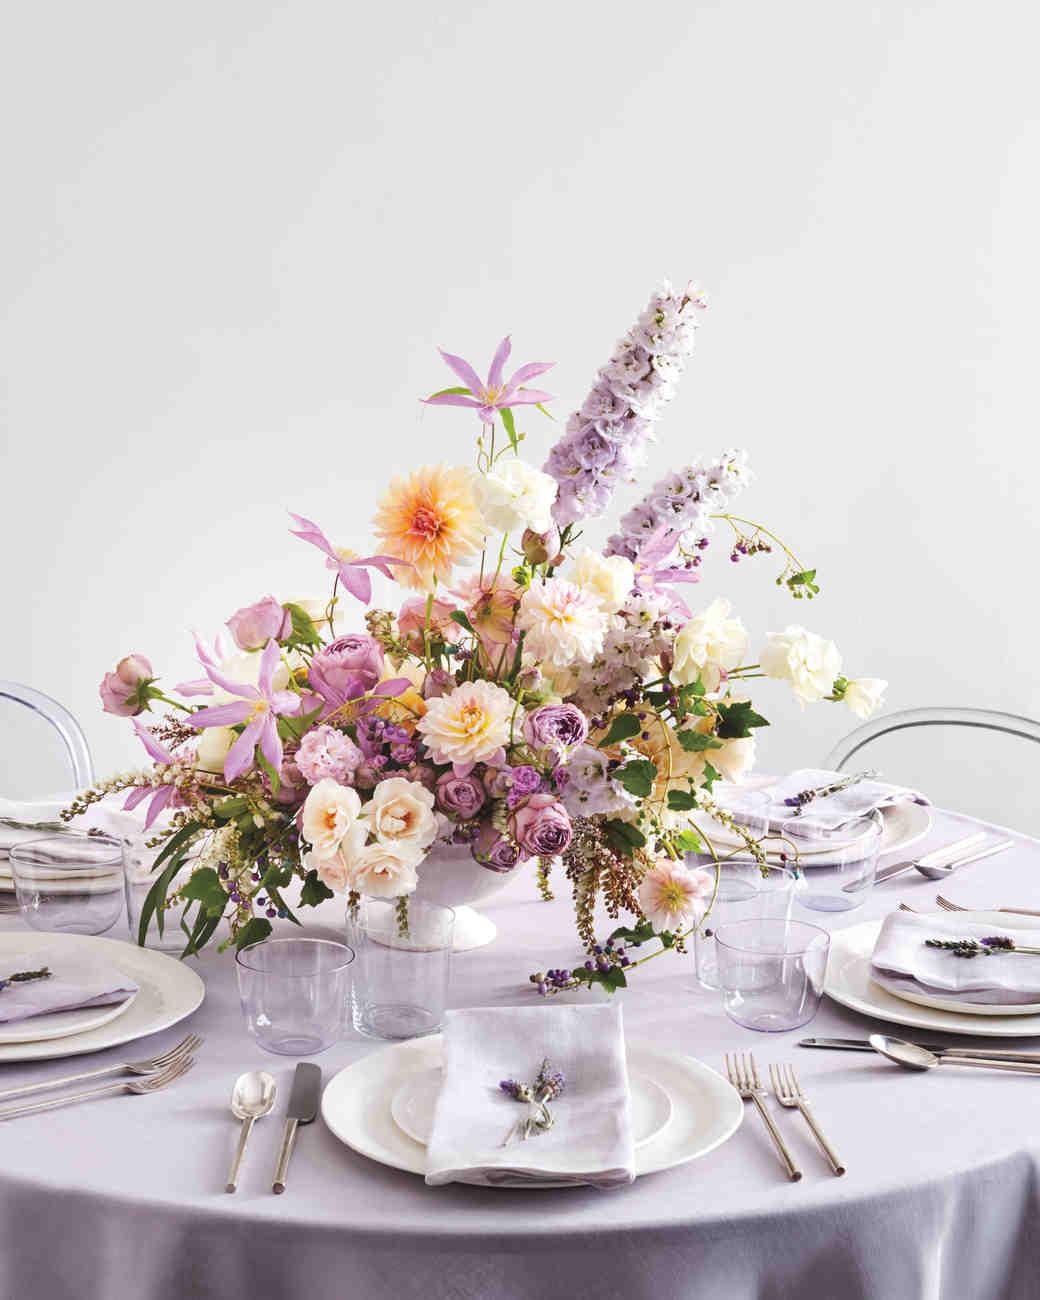 Best ideas about DIY Wedding Centerpieces . Save or Pin 23 DIY Wedding Centerpieces We Love Now.